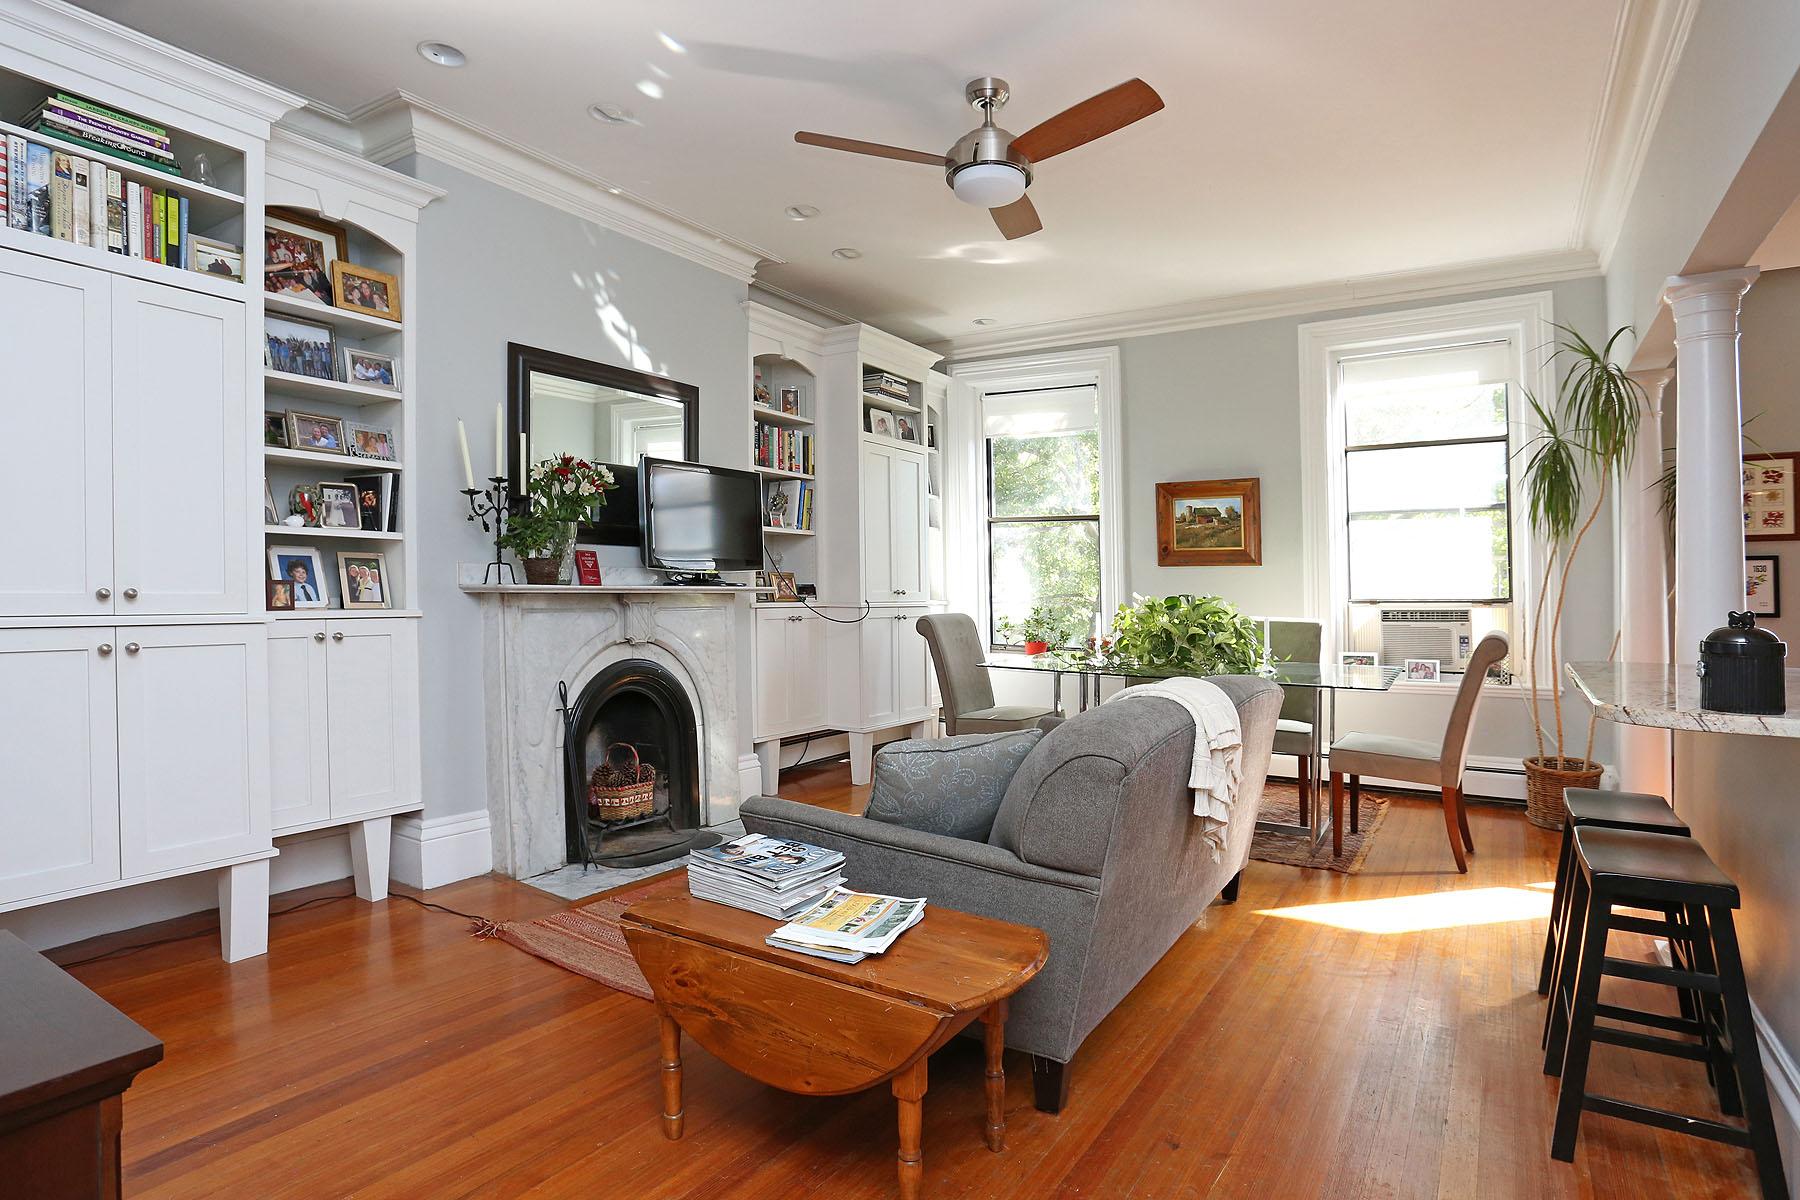 Condomínio para Venda às Beautiful Beacon Street Brownstone 445 Beacon Street Unit 3 Back Bay, Boston, Massachusetts 02115 Estados Unidos